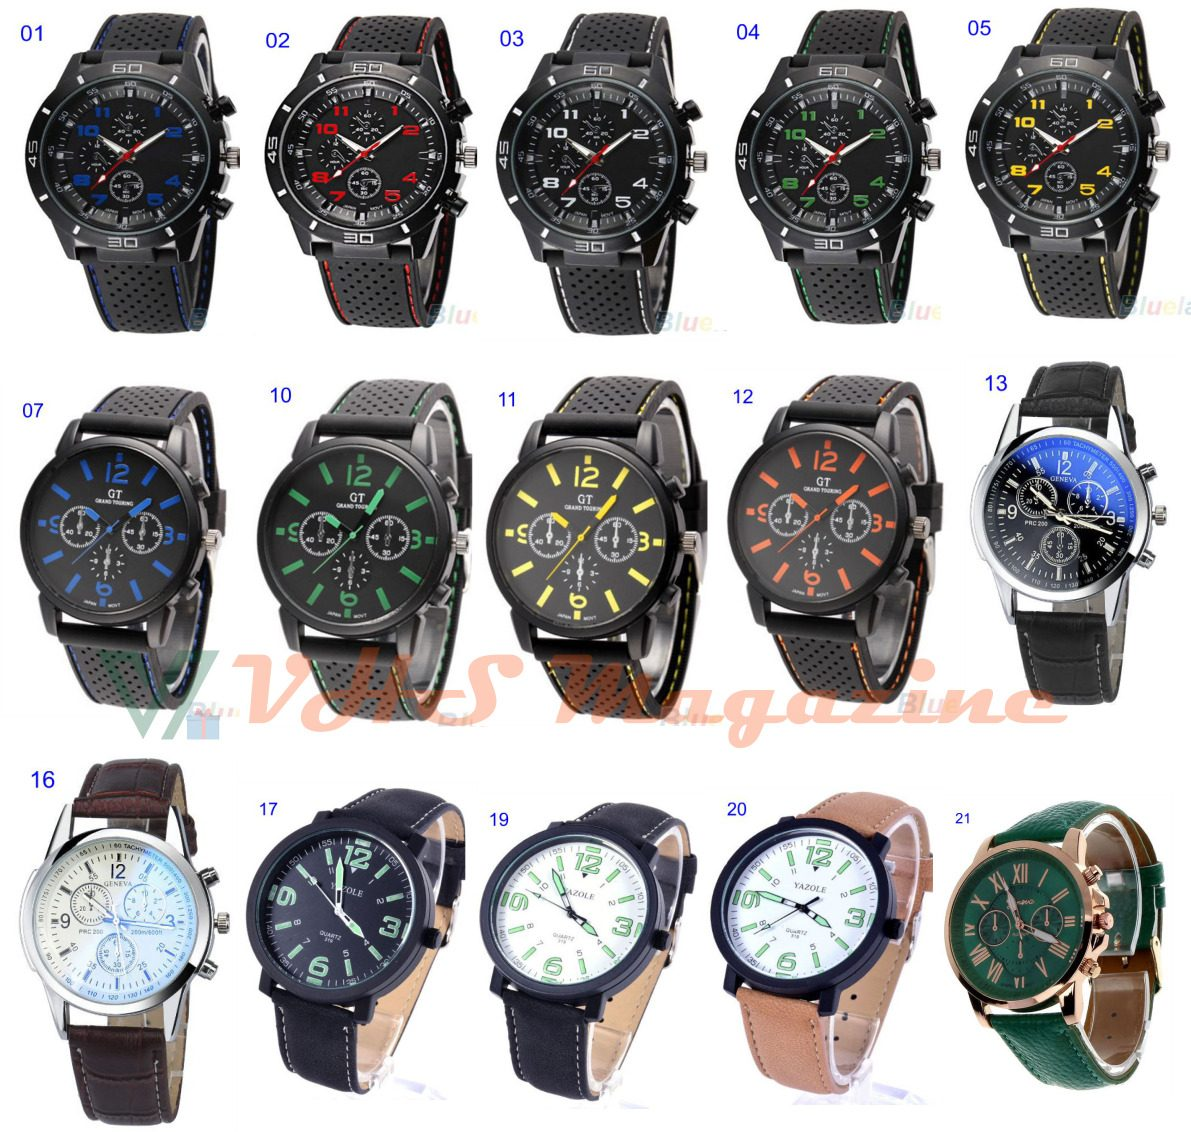 57633628446 Relógio Masculino Atacado Revenda Kit Com 10 Pçs Cód.054 - R  249